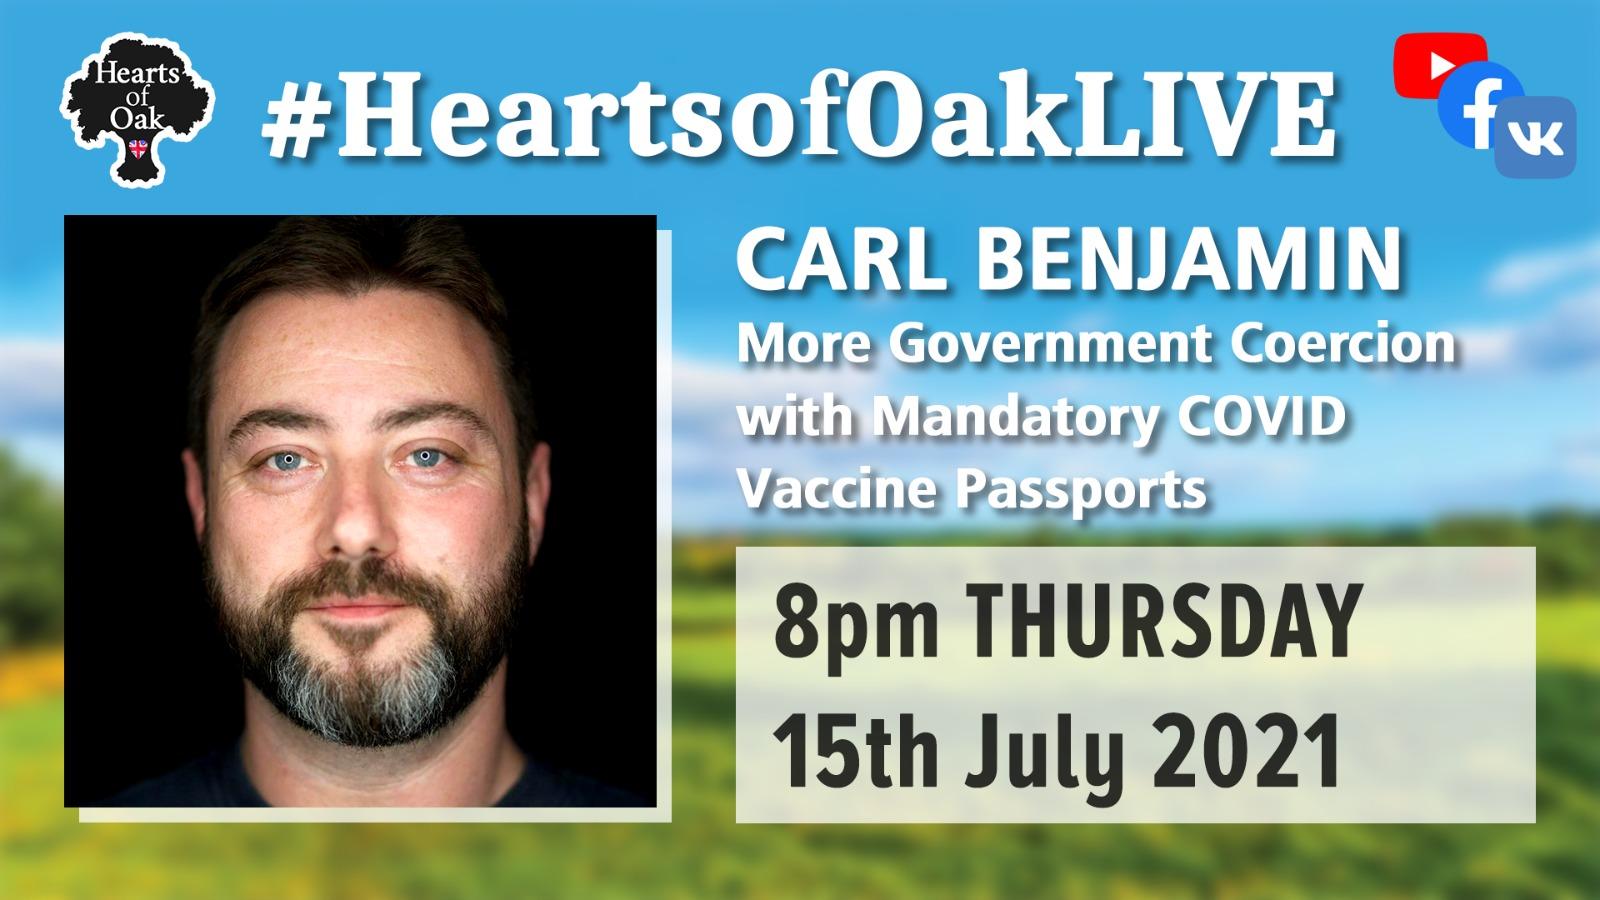 Carl Benjamin: More Government Coercion with Mandatory Covid Vaccine Passports